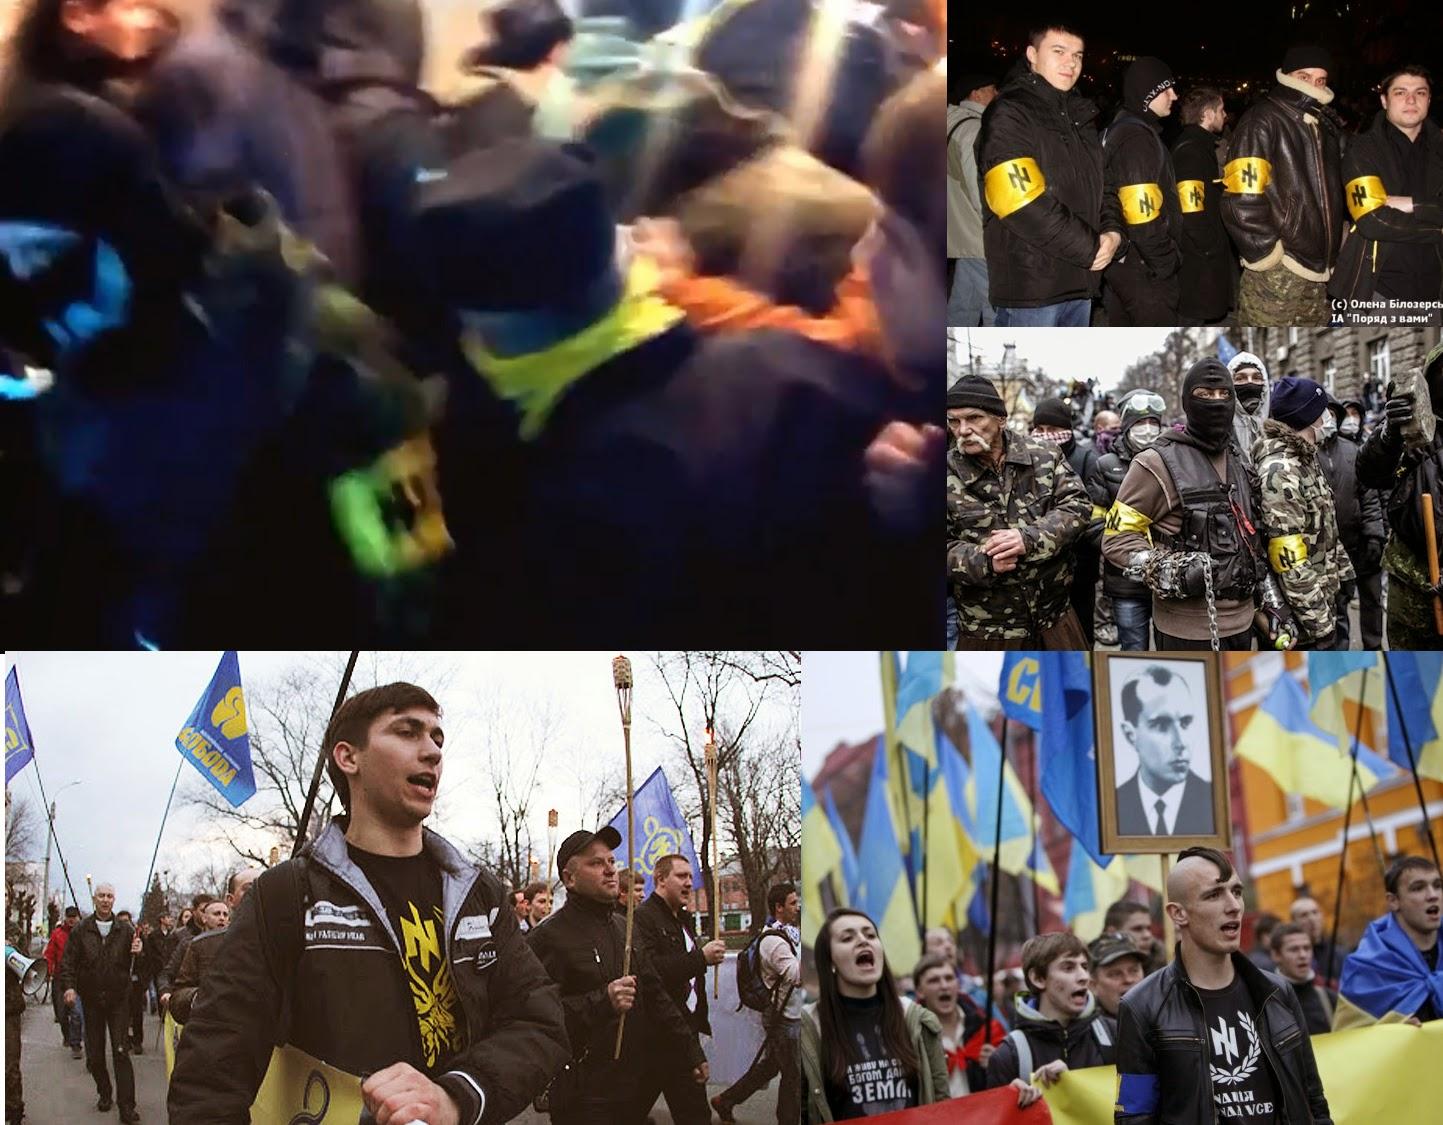 NATOs Pet Nazis Savage Ukrainian Presidential Candidate Svoboda Wolfsangel April2014